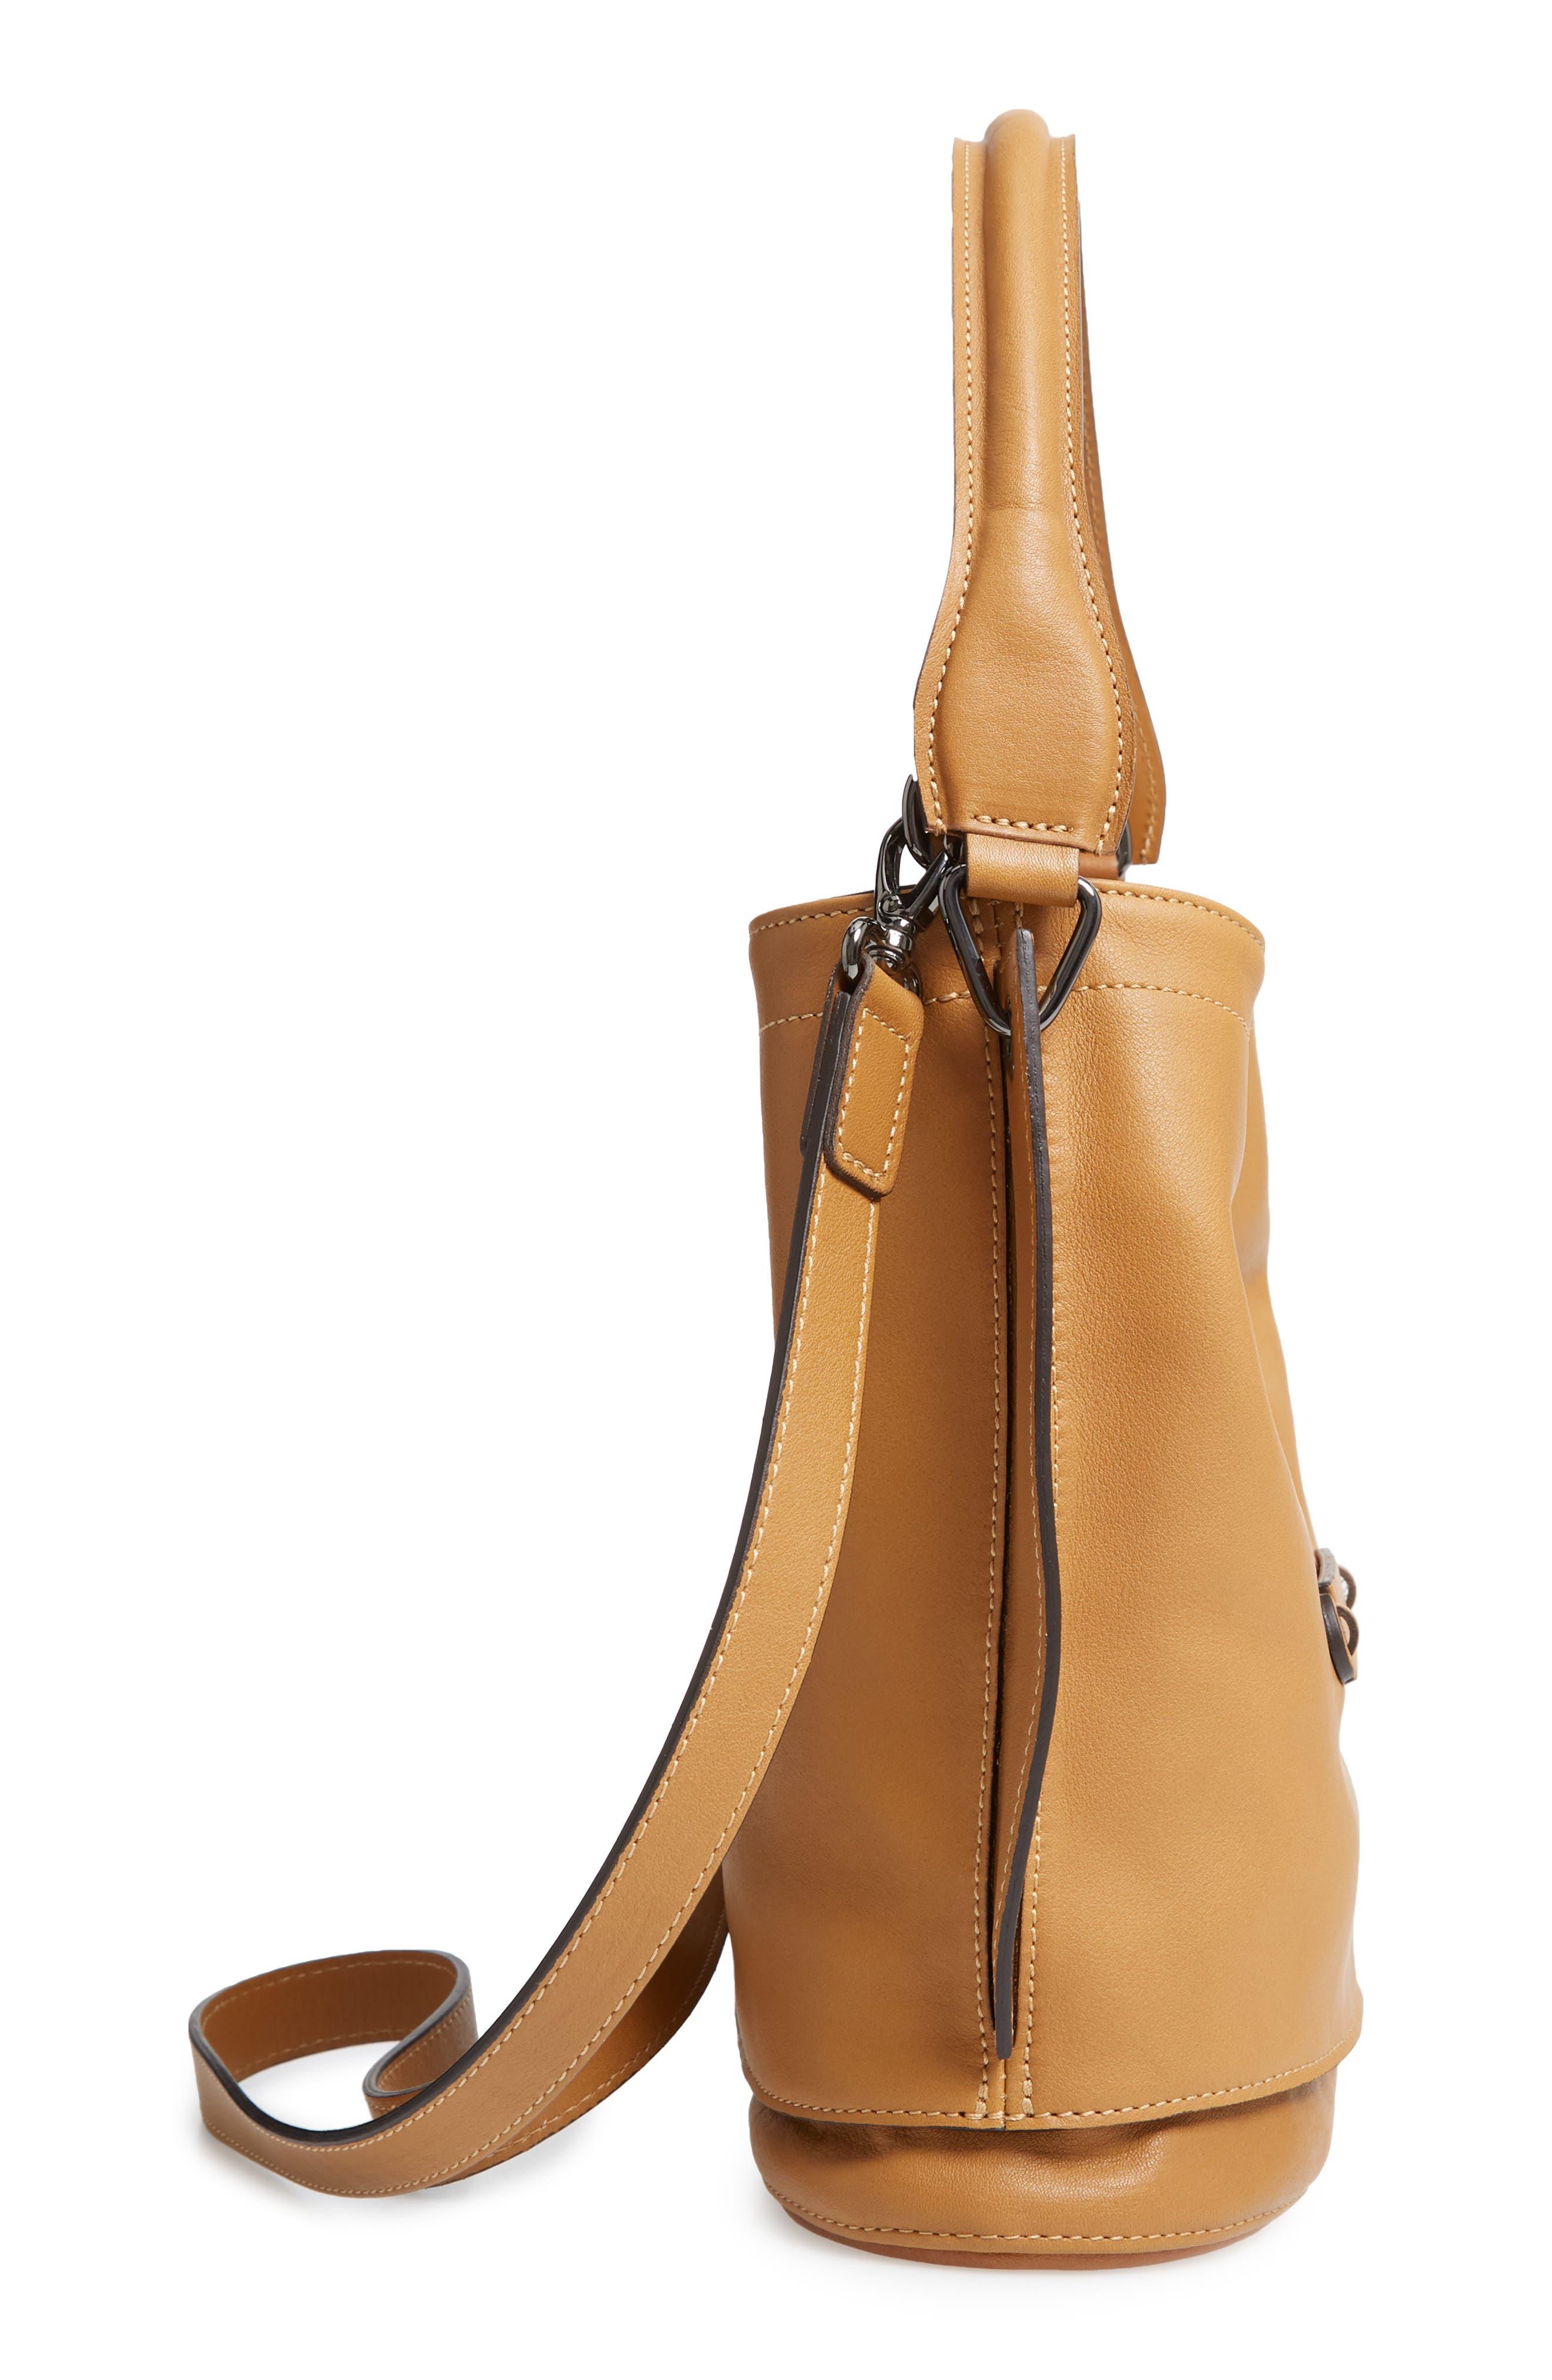 3D Leather Bucket Bag,                             Alternate thumbnail 5, color,                             NATURAL